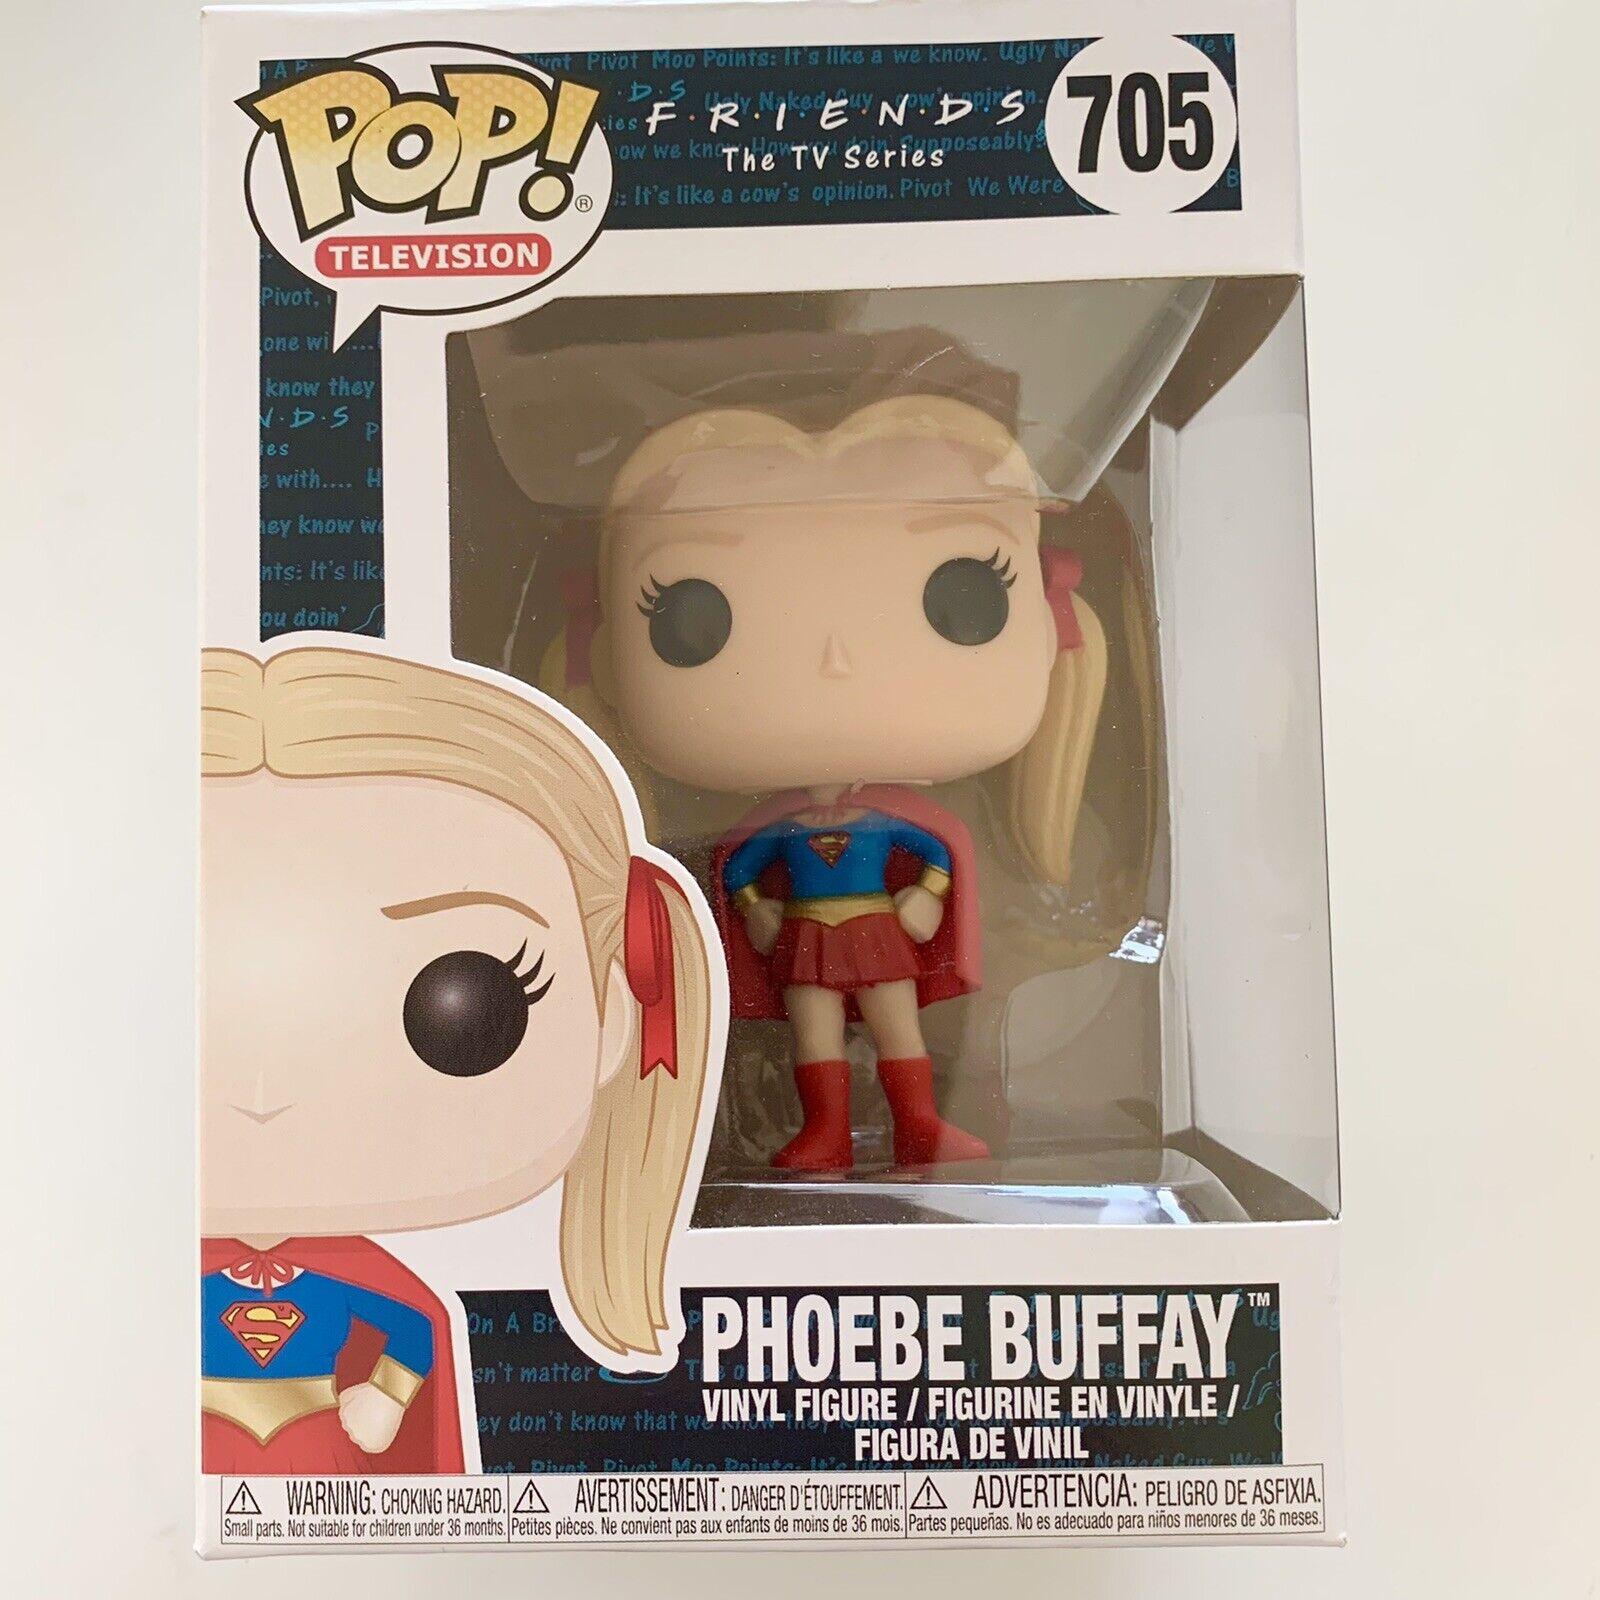 FUNKO Friends Pop! Vinyl Figure Phoebe Buffay Supergirl [705] Minor Box Wear